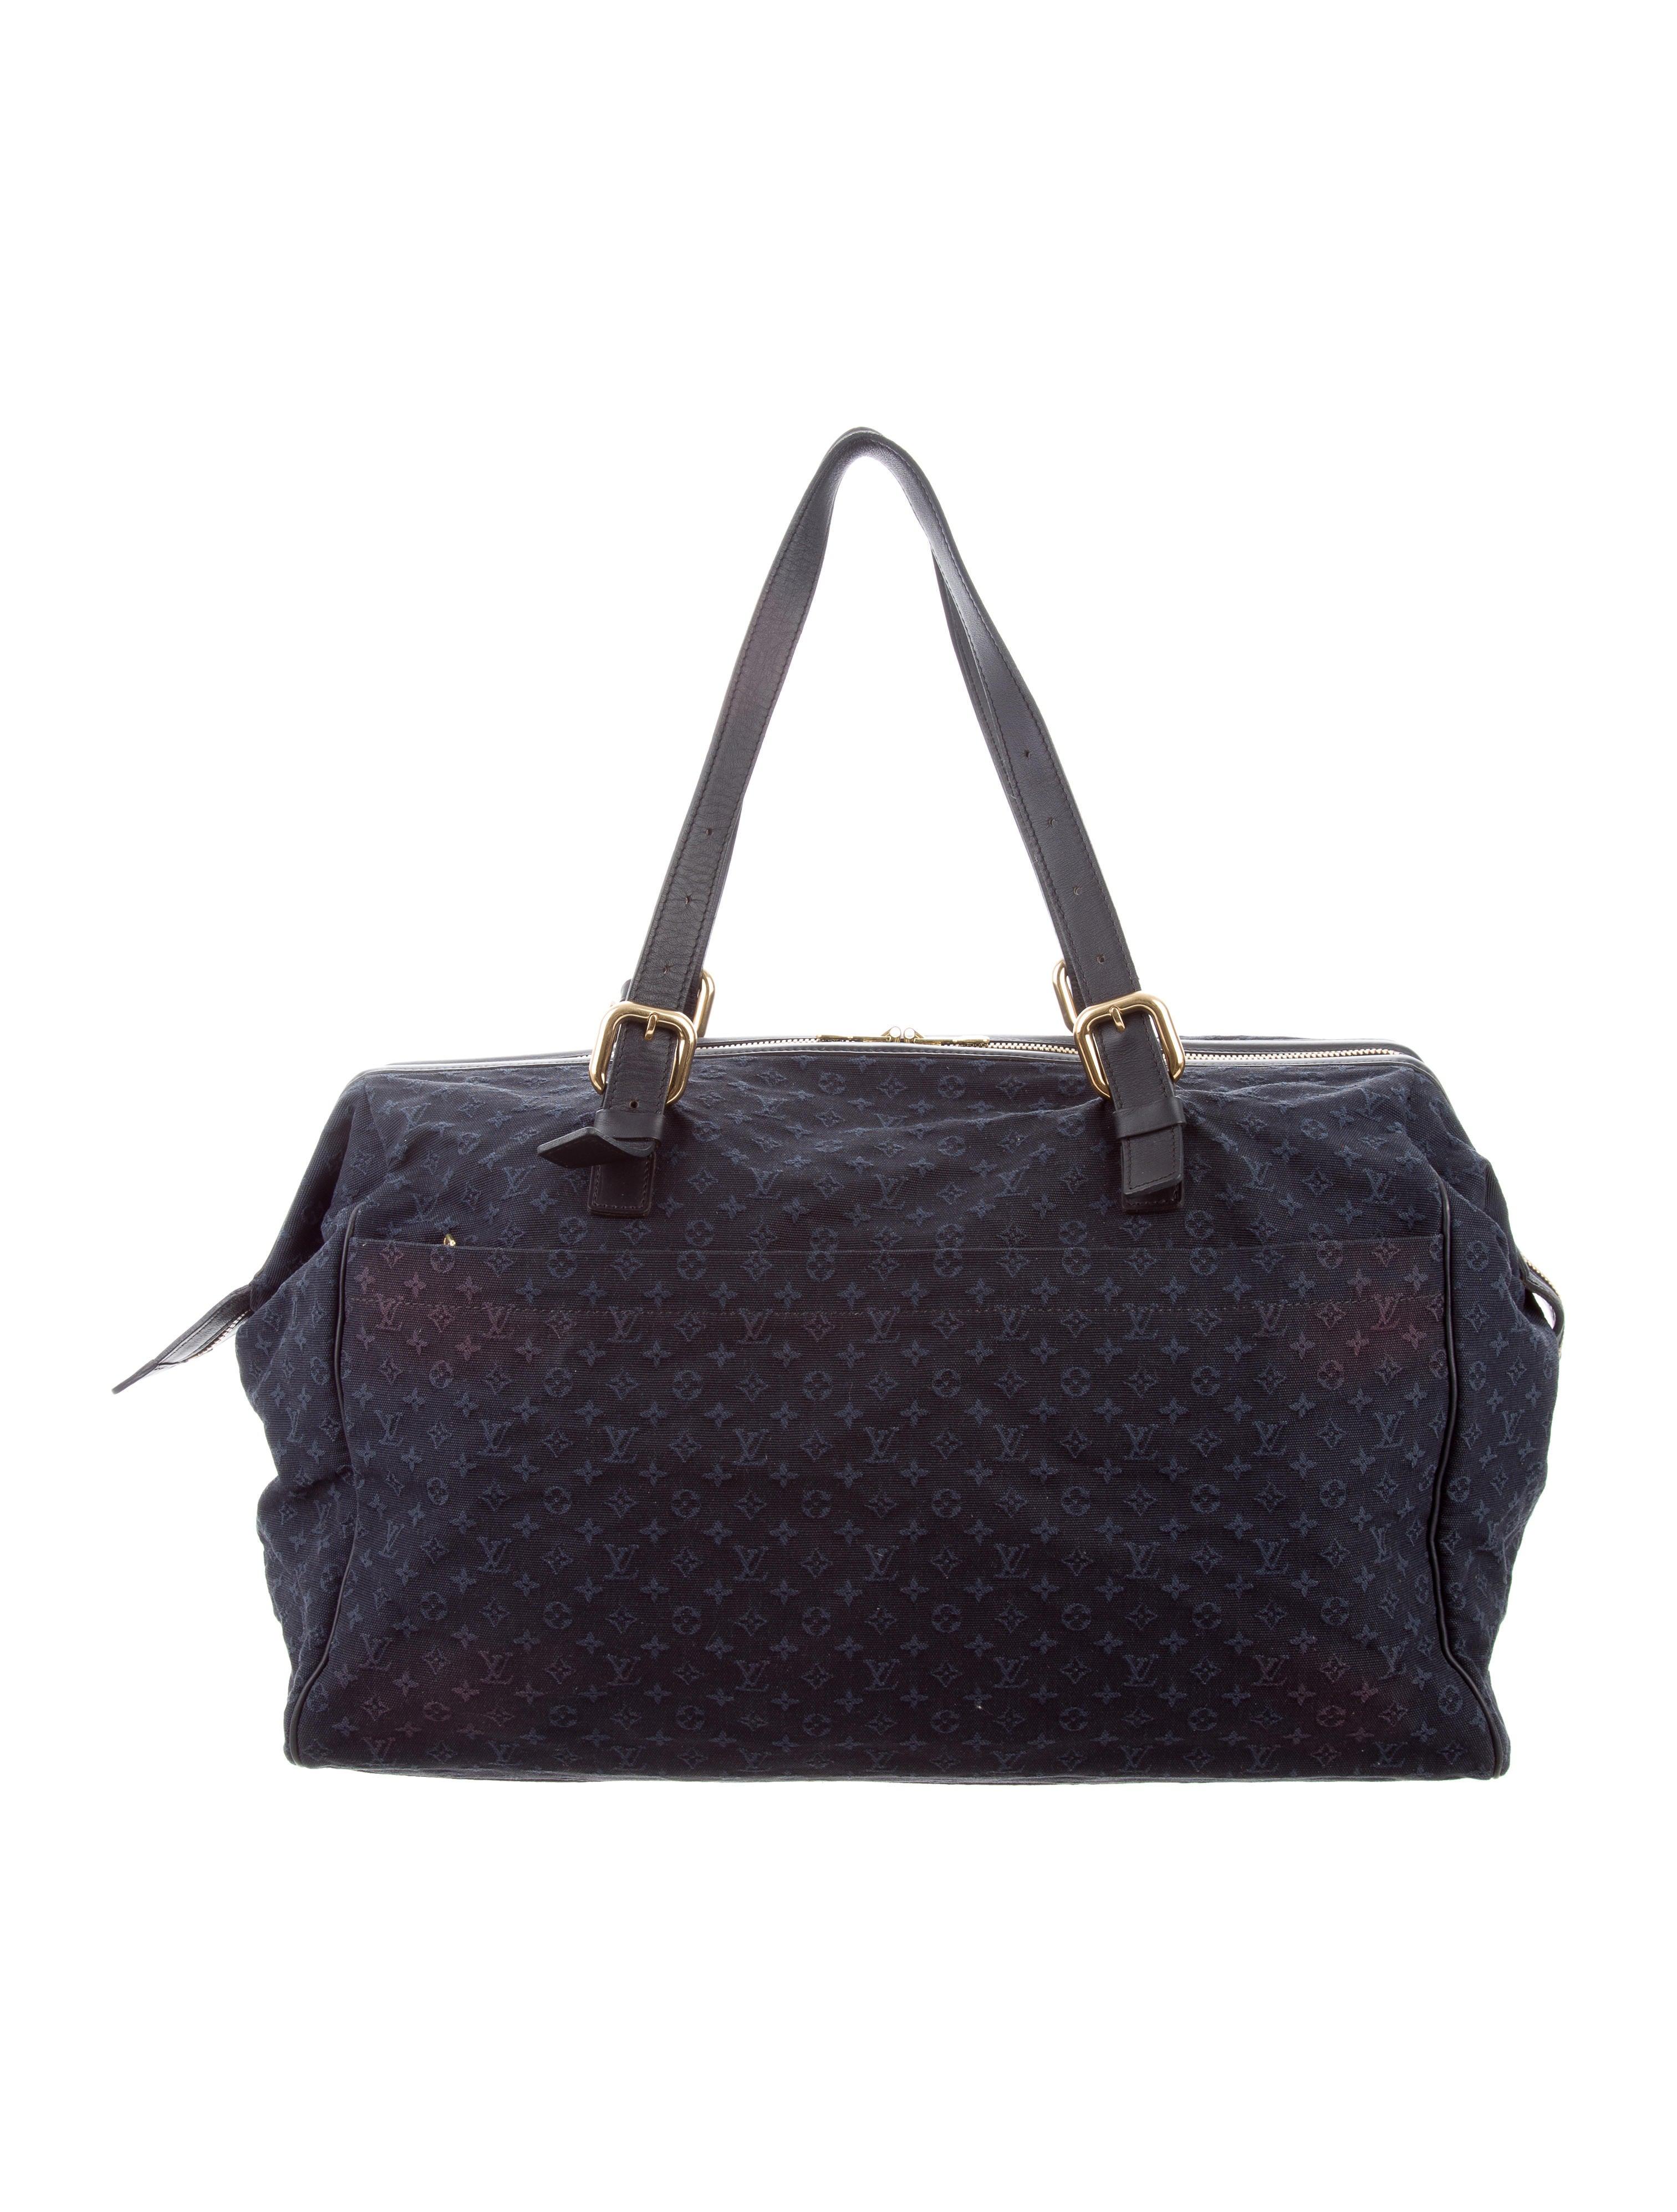 louis vuitton mini lin louise weekender bag bags lou144391 the